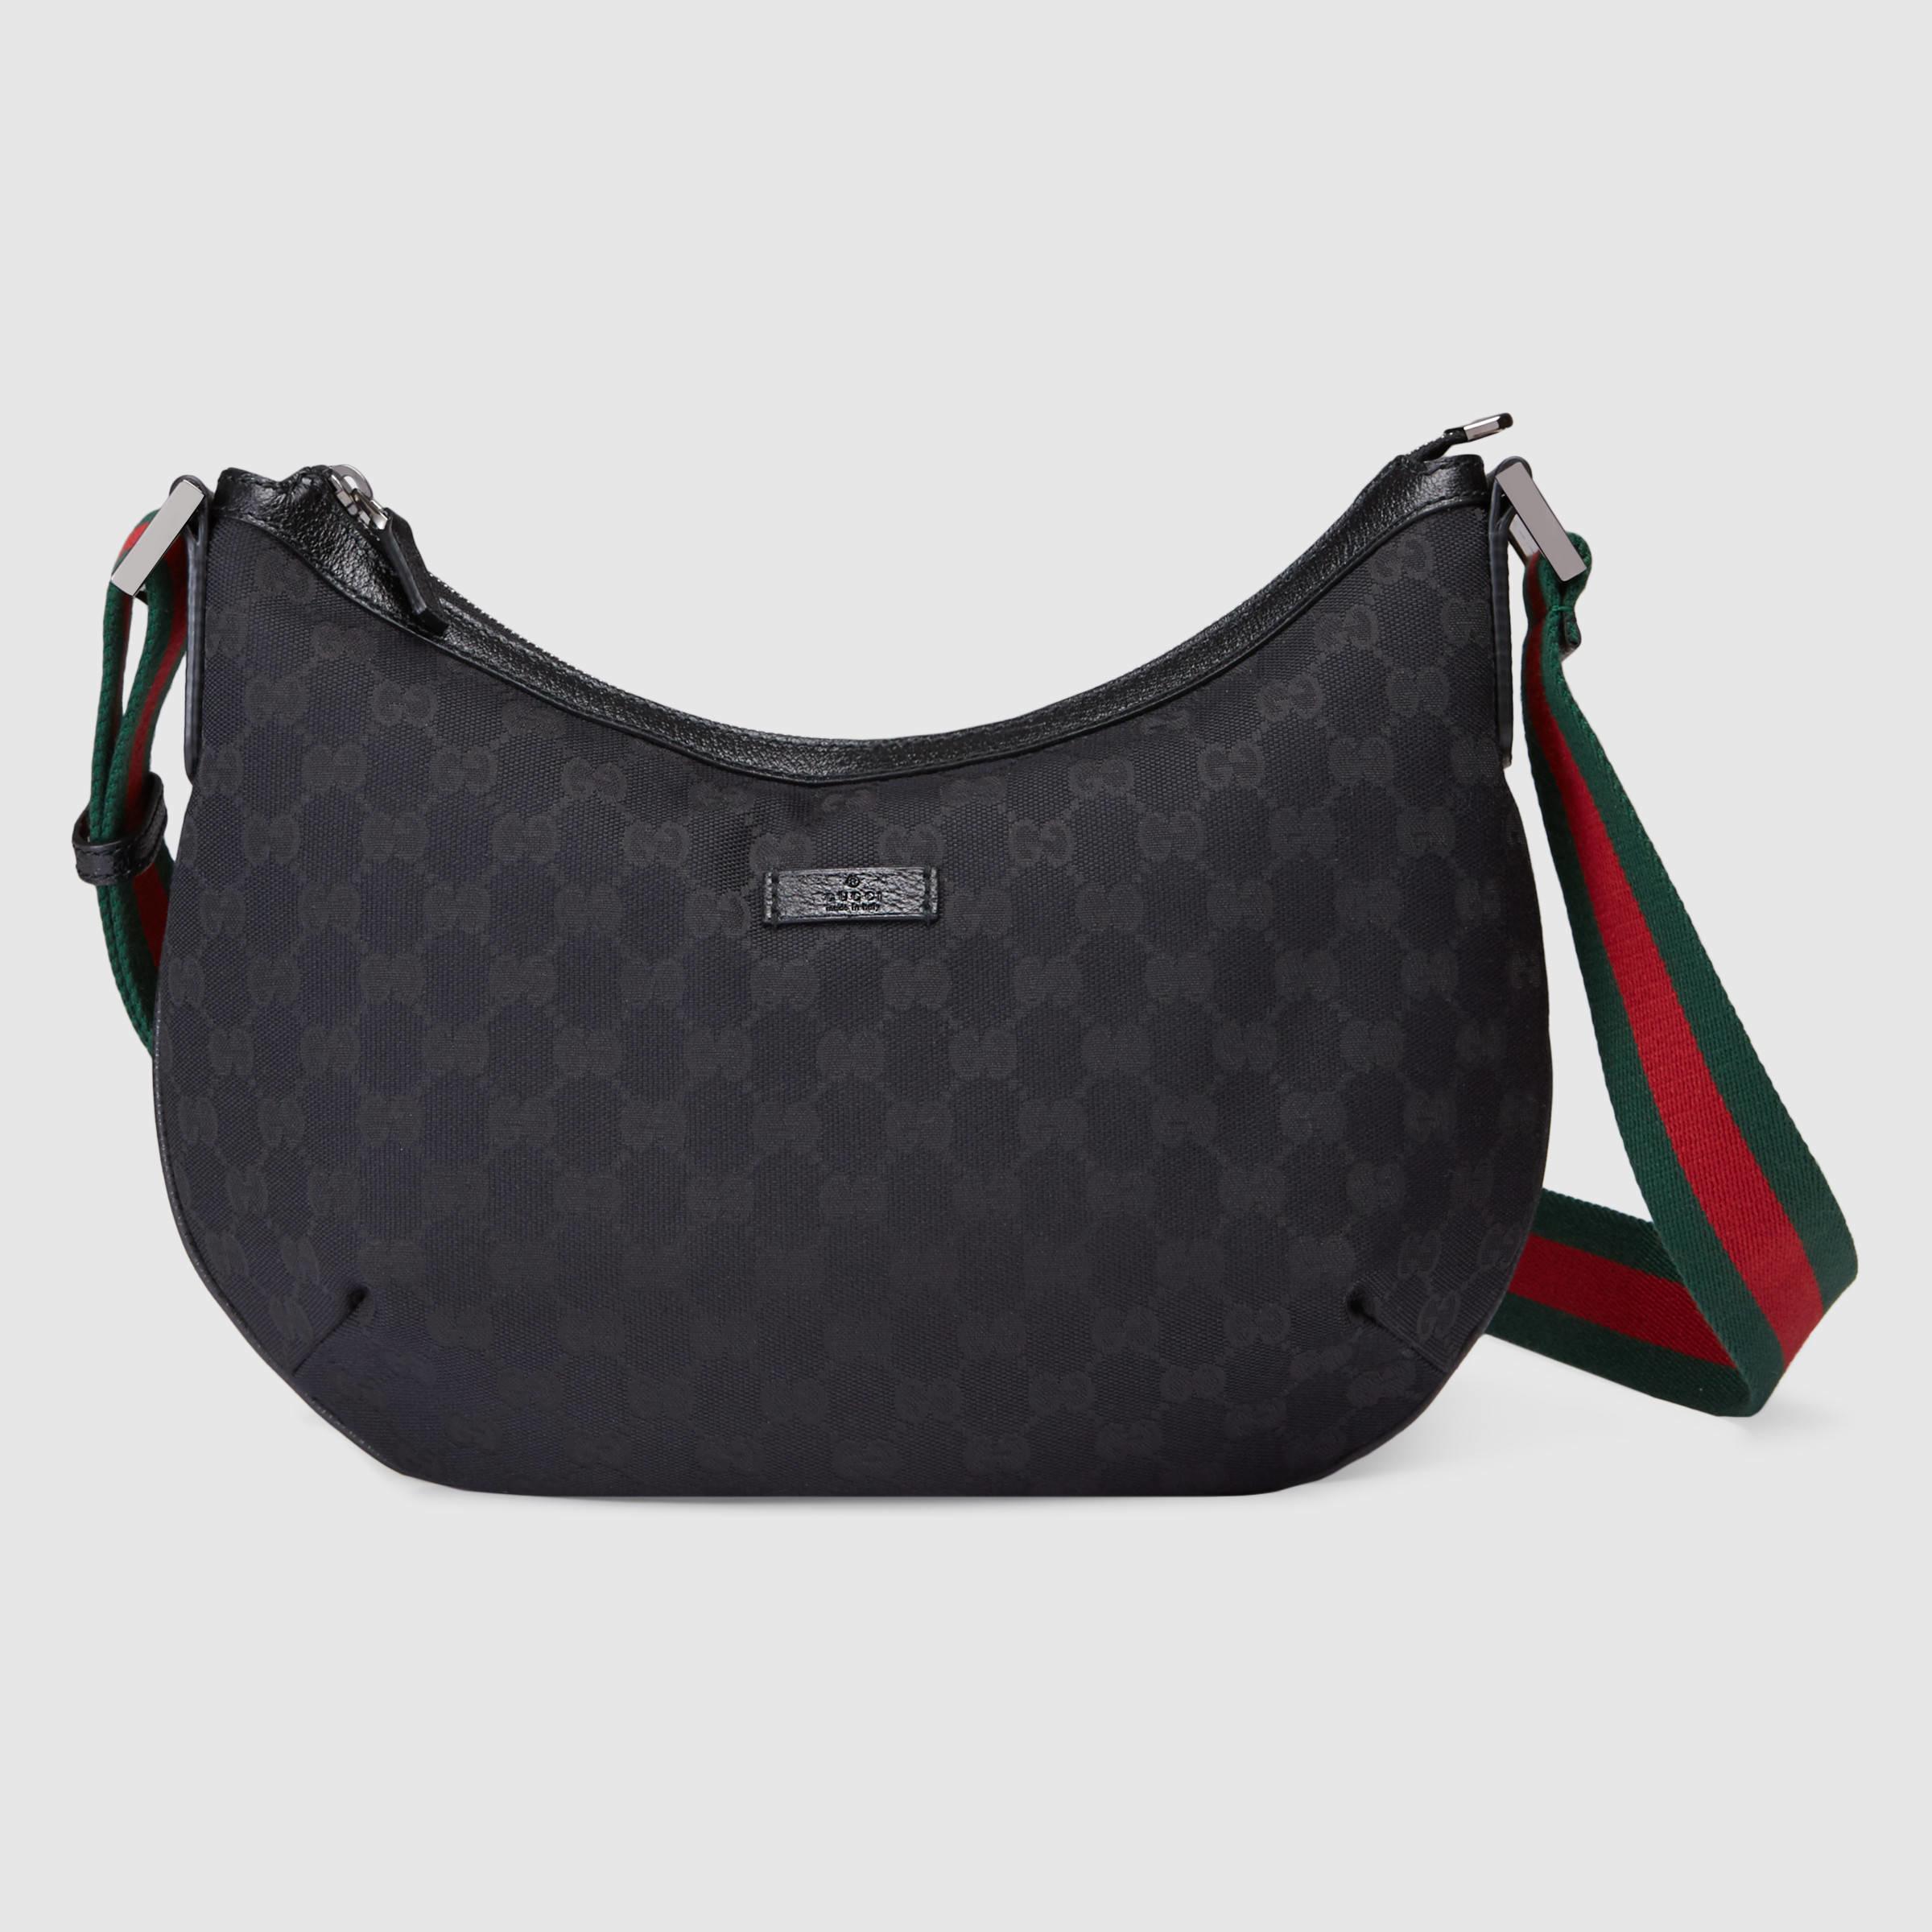 21726646d Lyst - Gucci Original Gg Canvas Messenger Bag in Green for Men